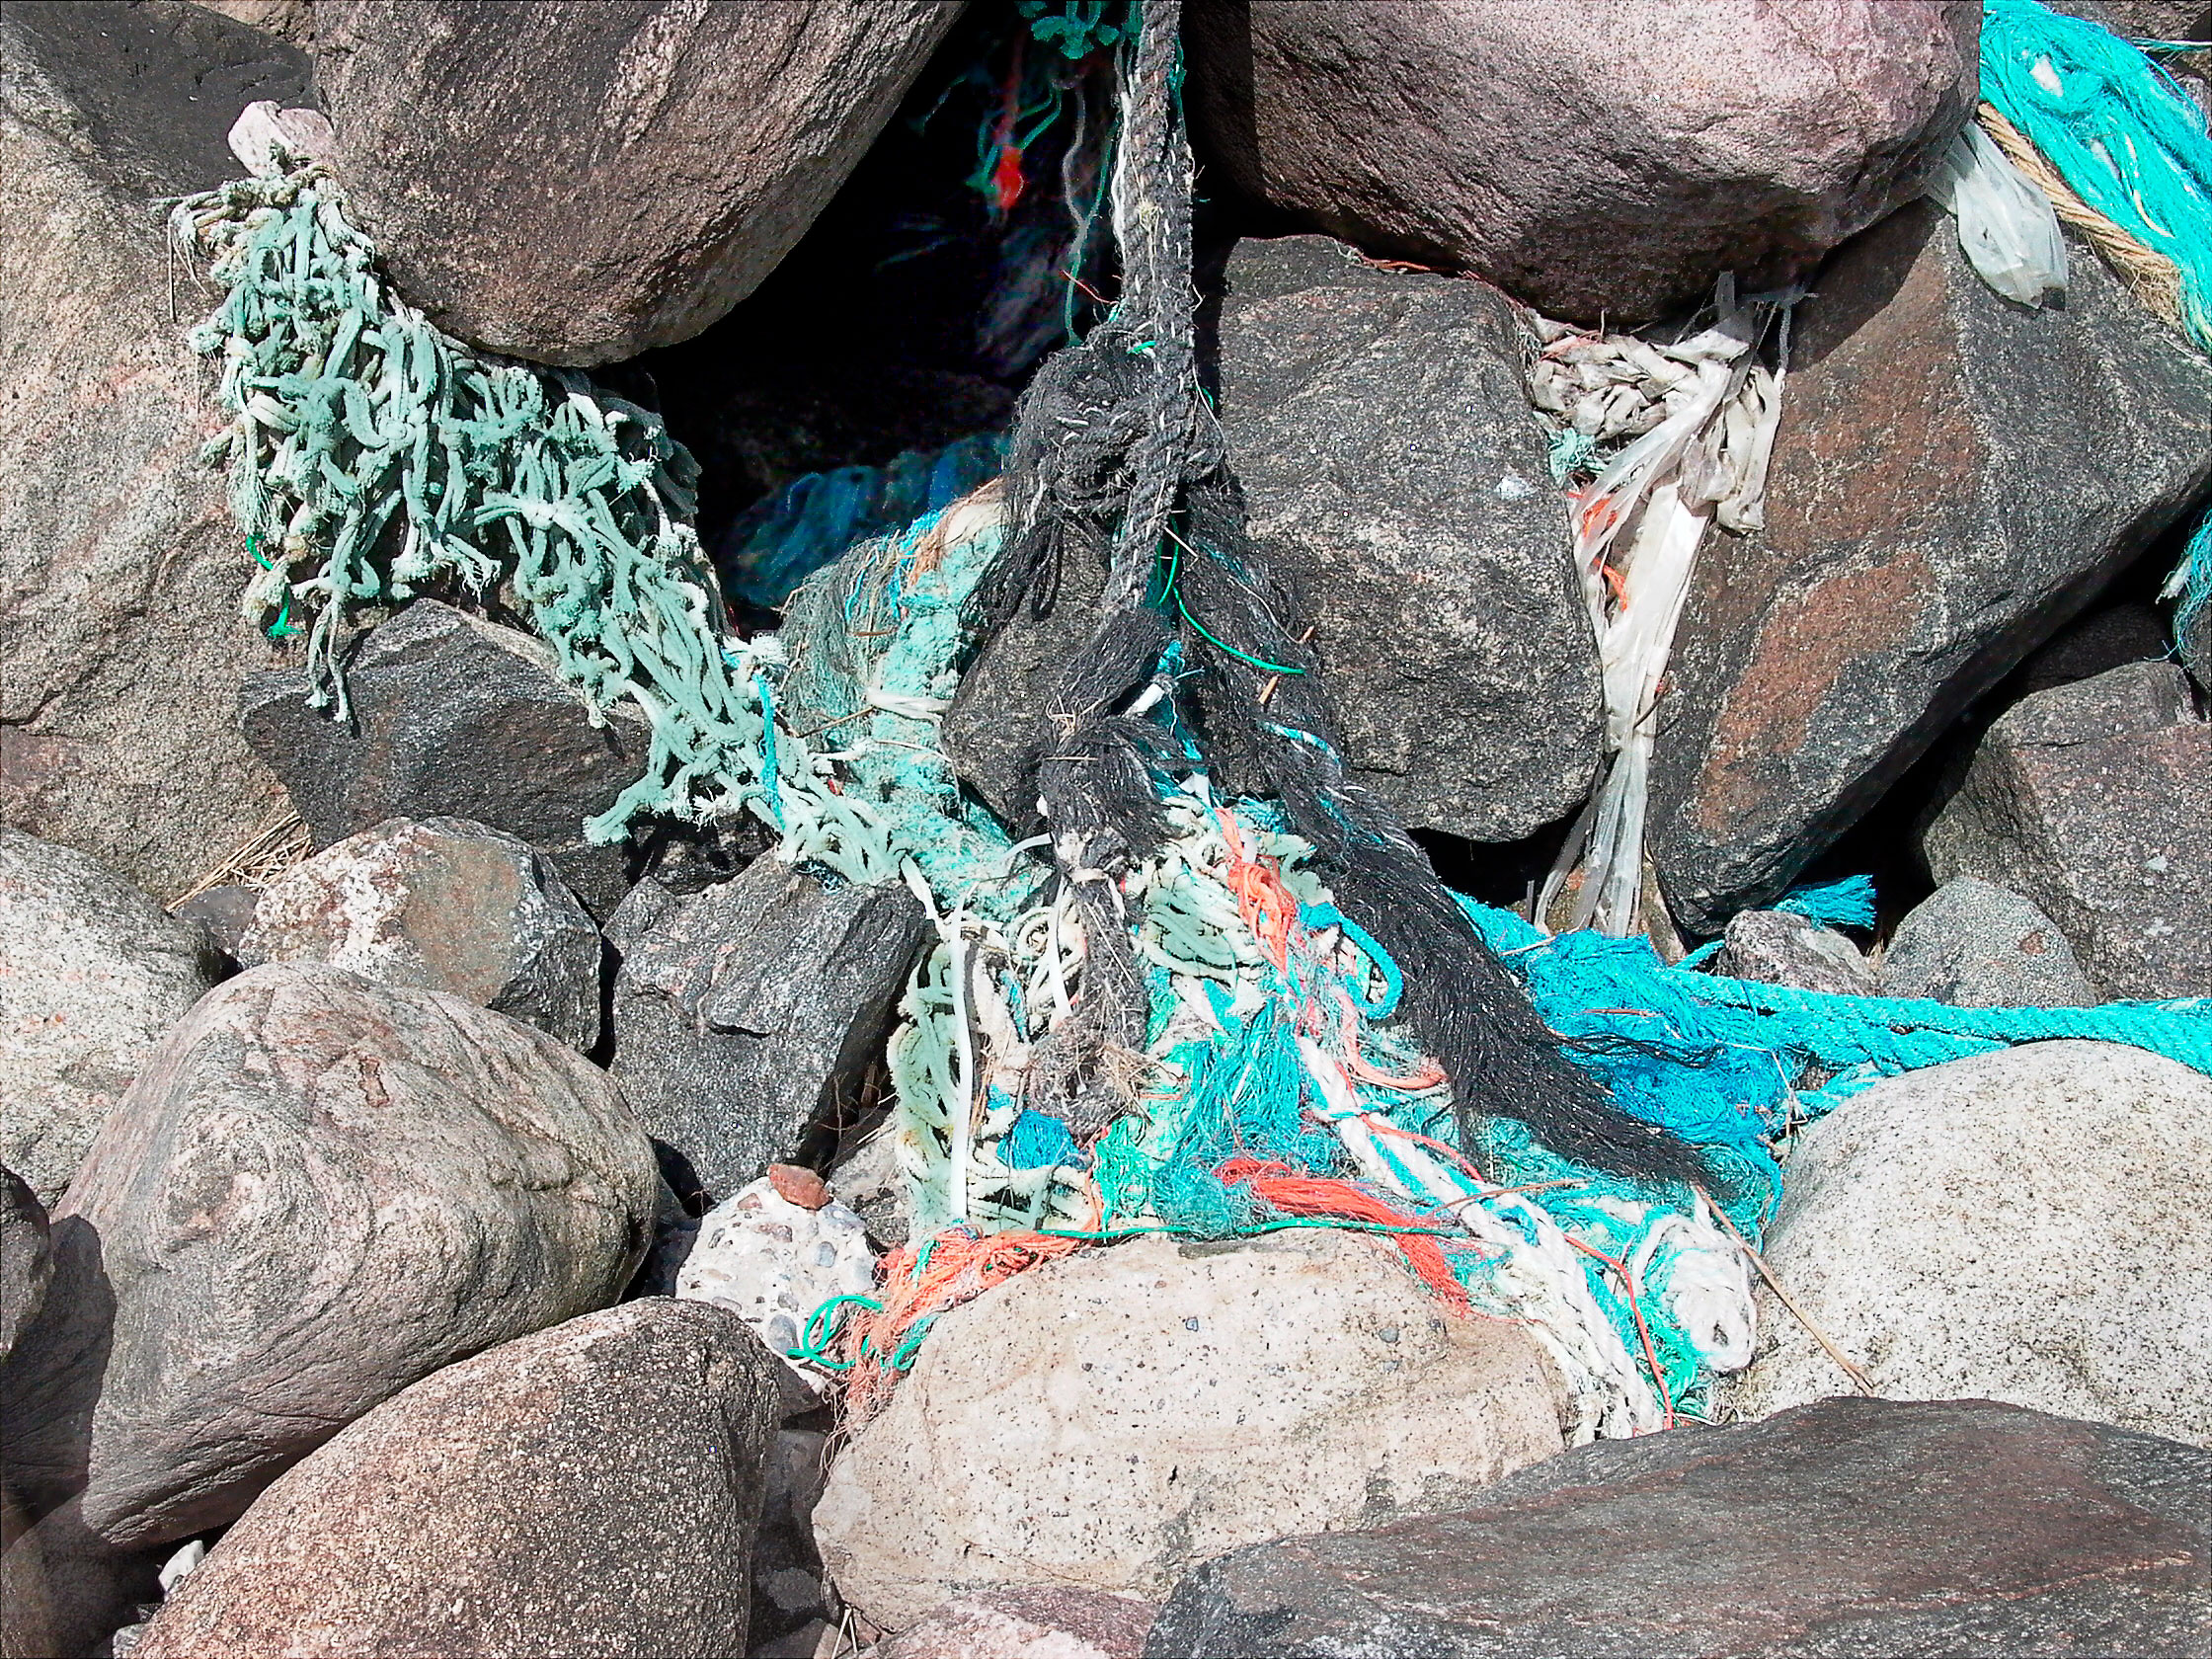 Wreckage #005  / Nr. Lyngby, Denmark / Spring_2007.